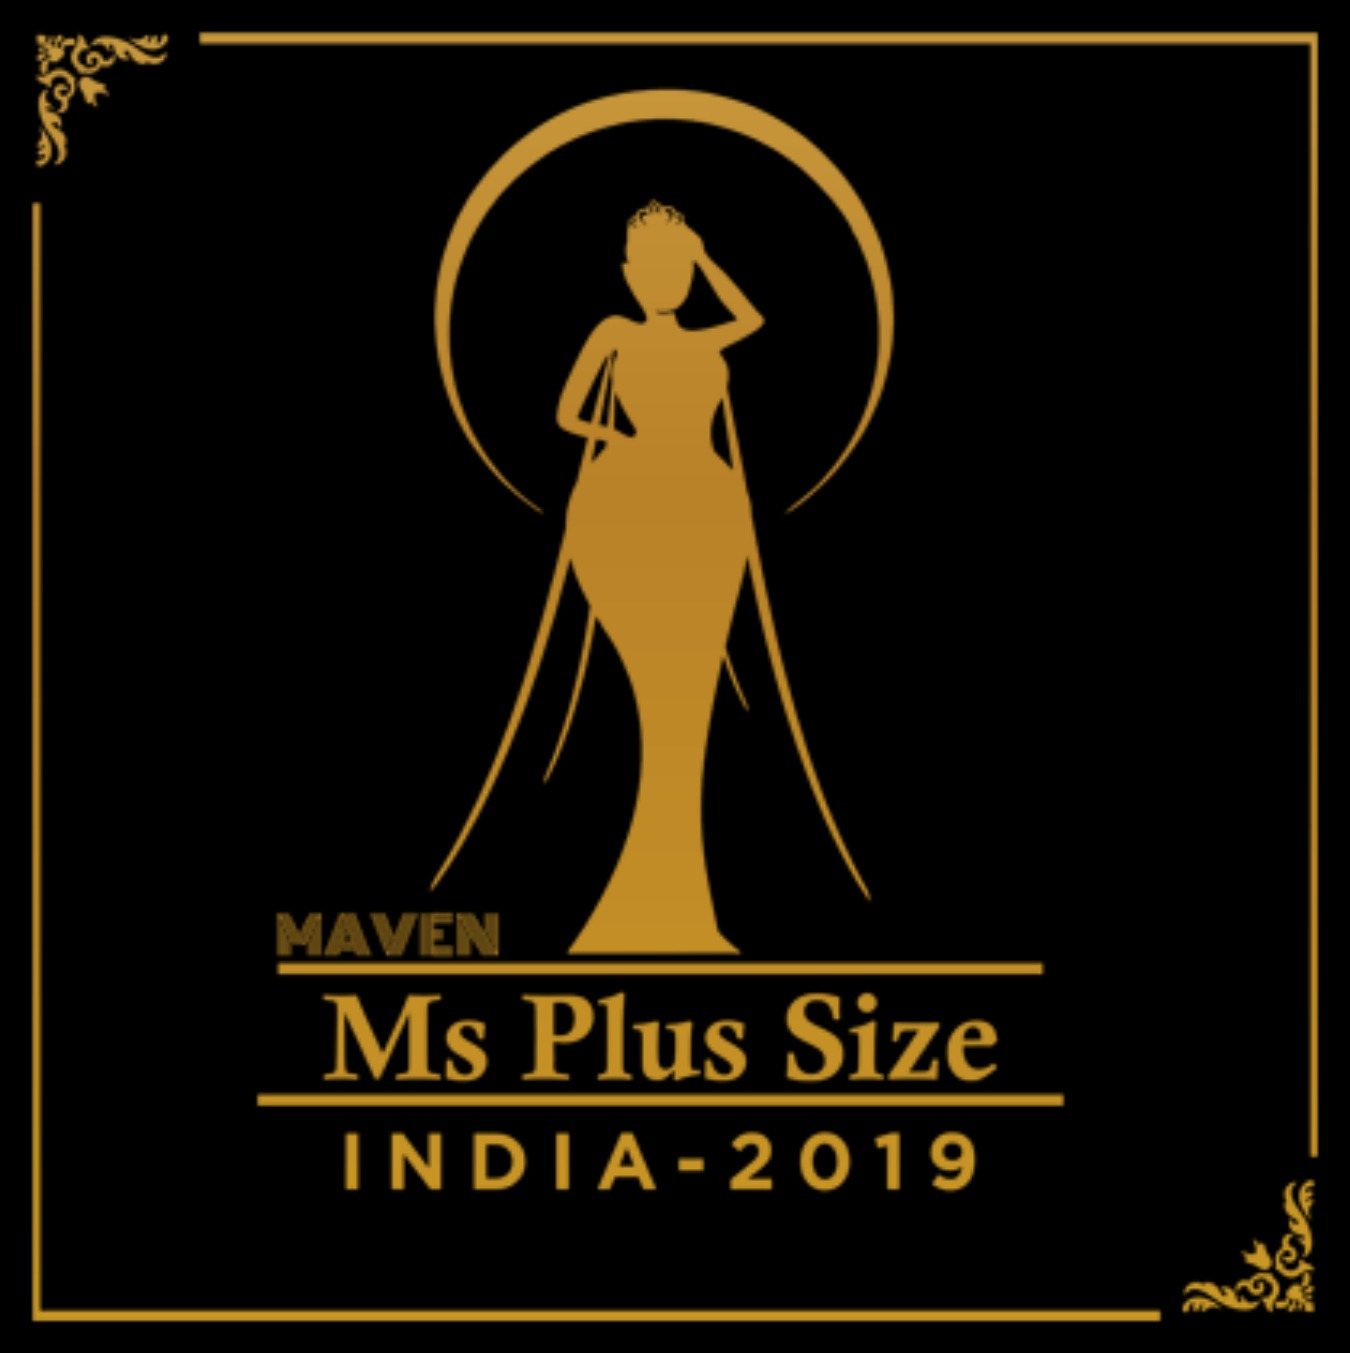 Maven Ms Plus Size India 2019